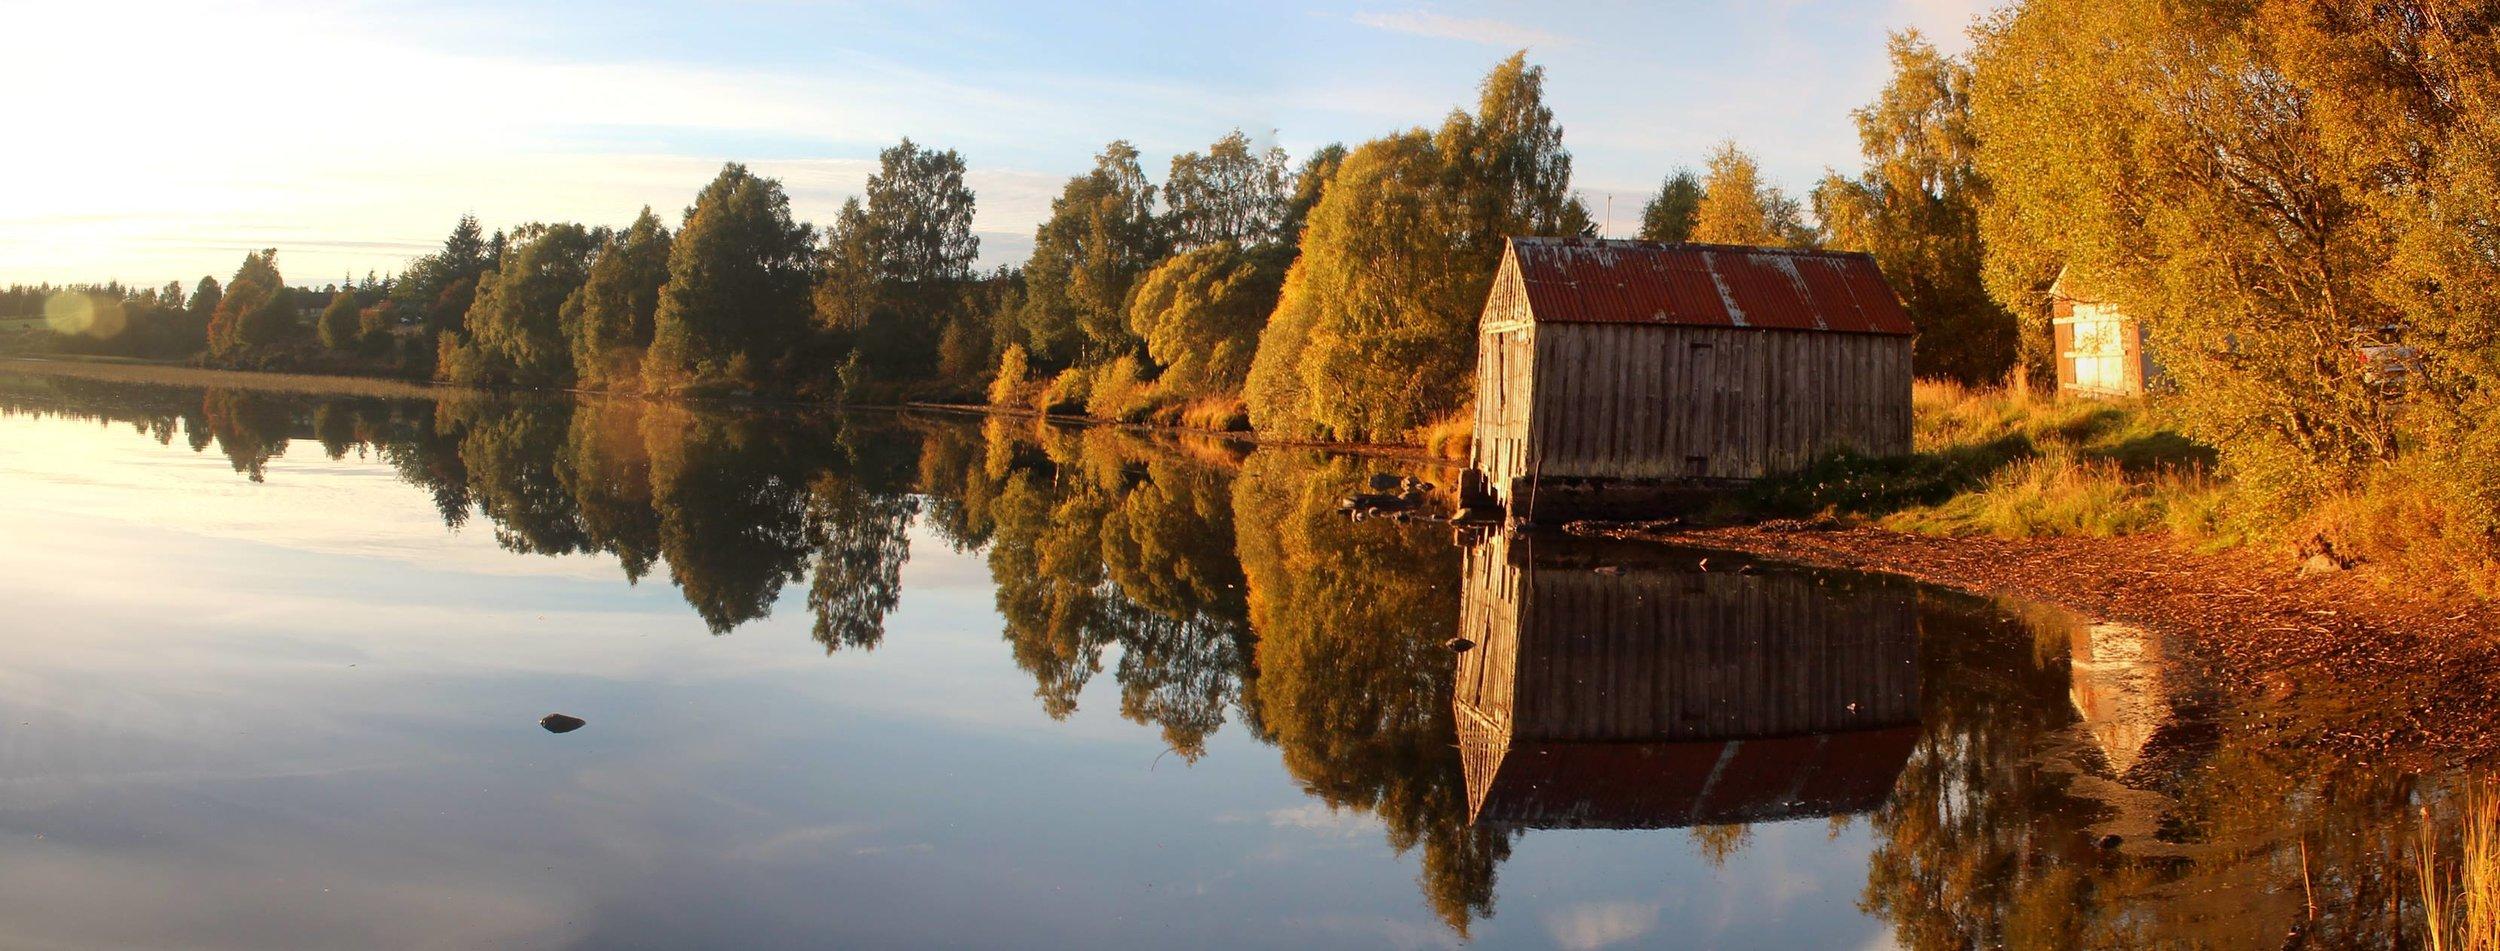 Loch Laide Boathouse Autumn.jpg